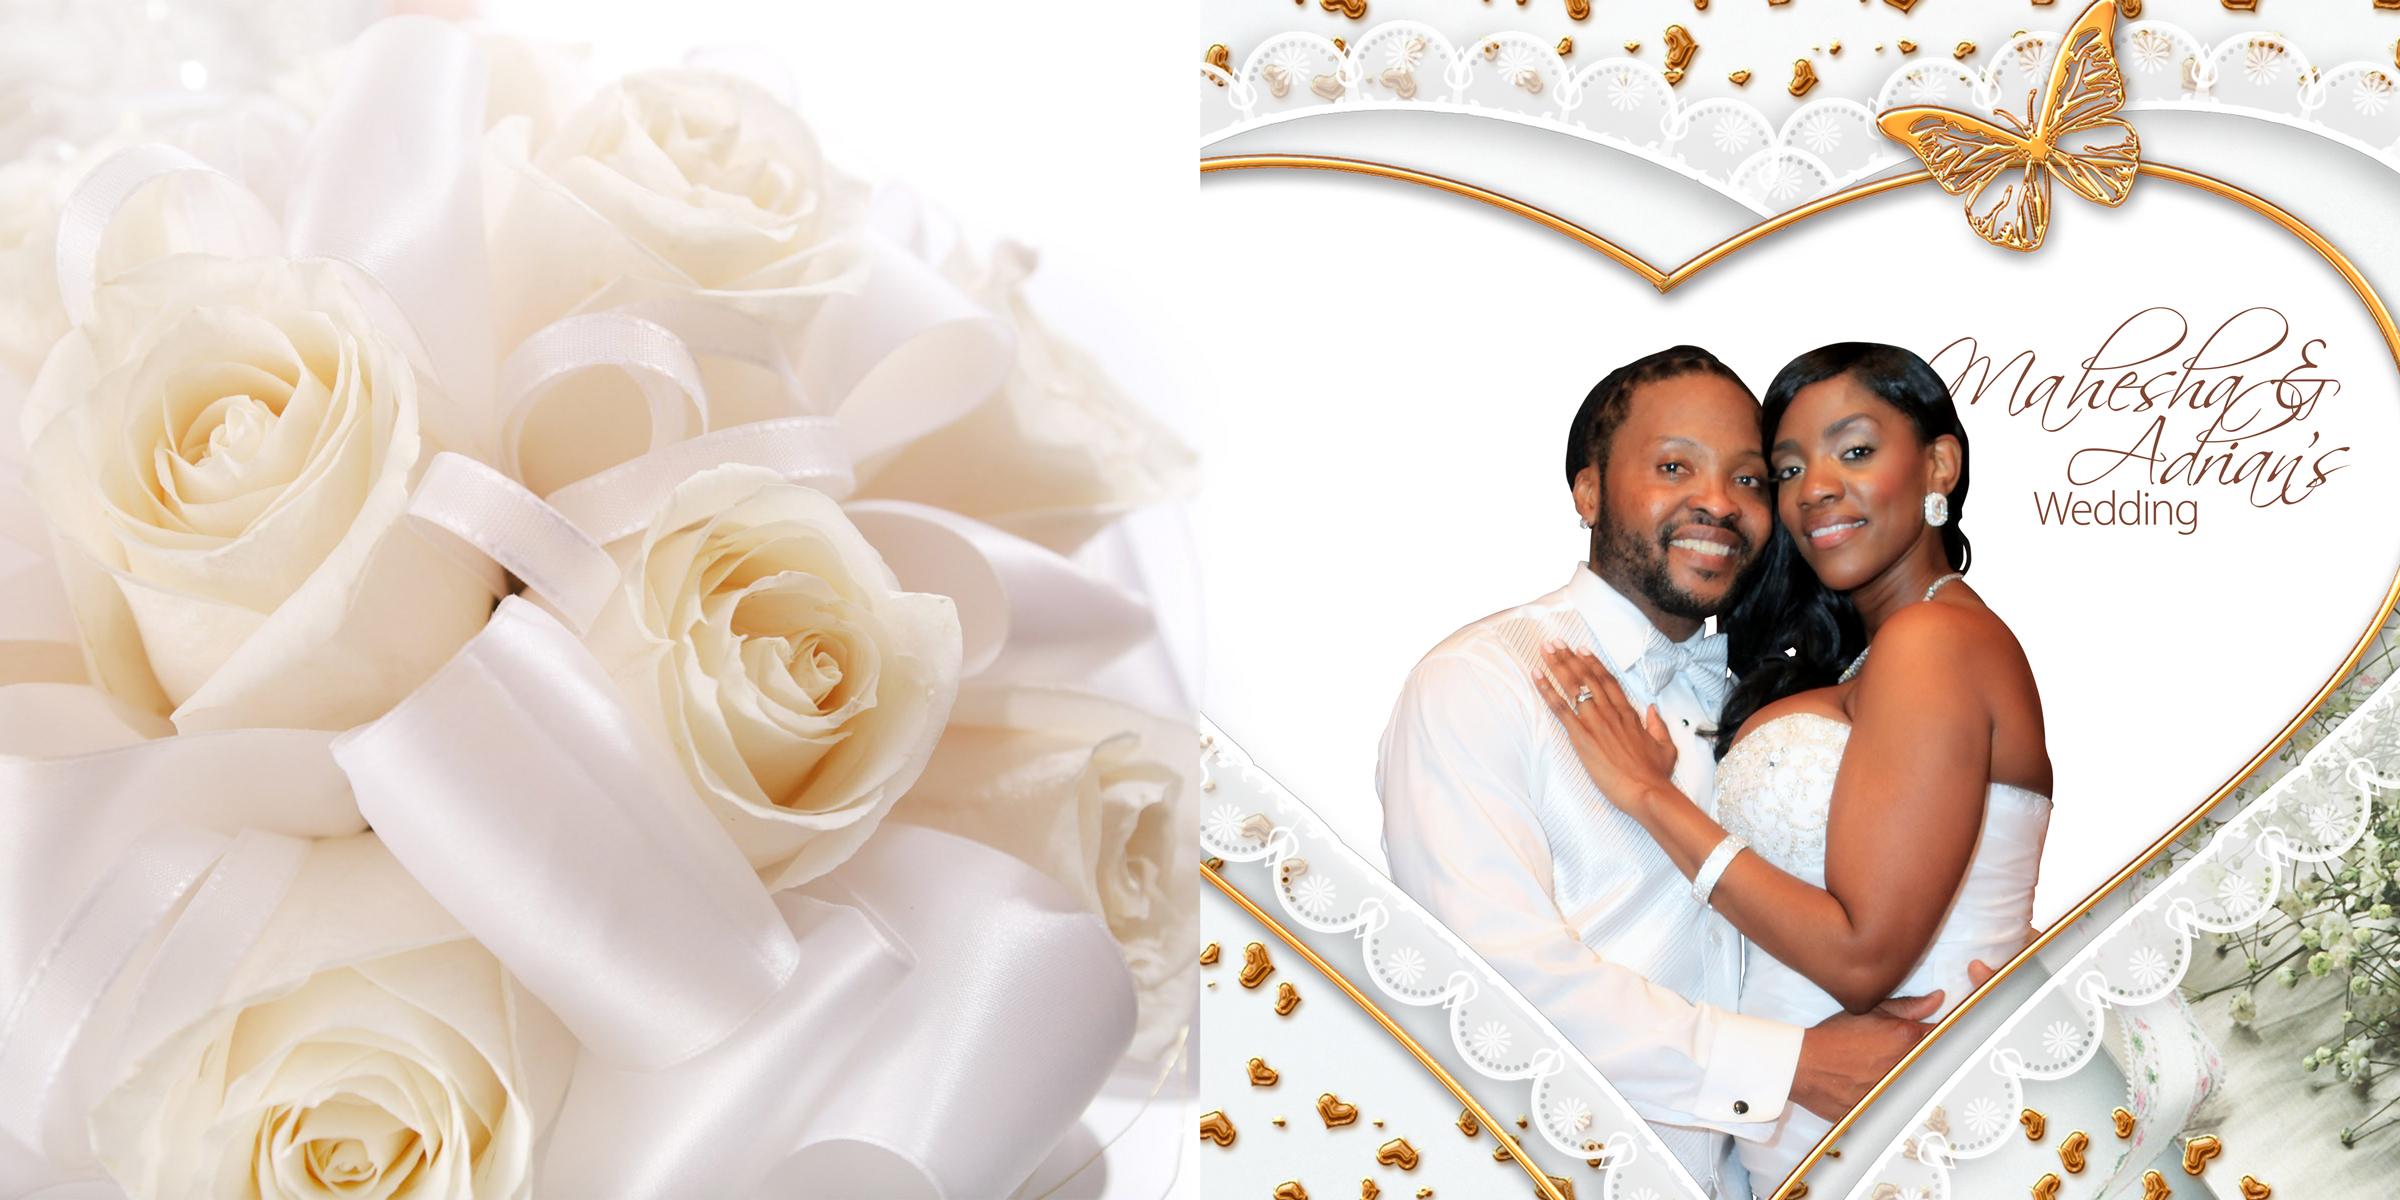 Wedding Guest Book Cover Design : Wedding photo book cover design pixshark